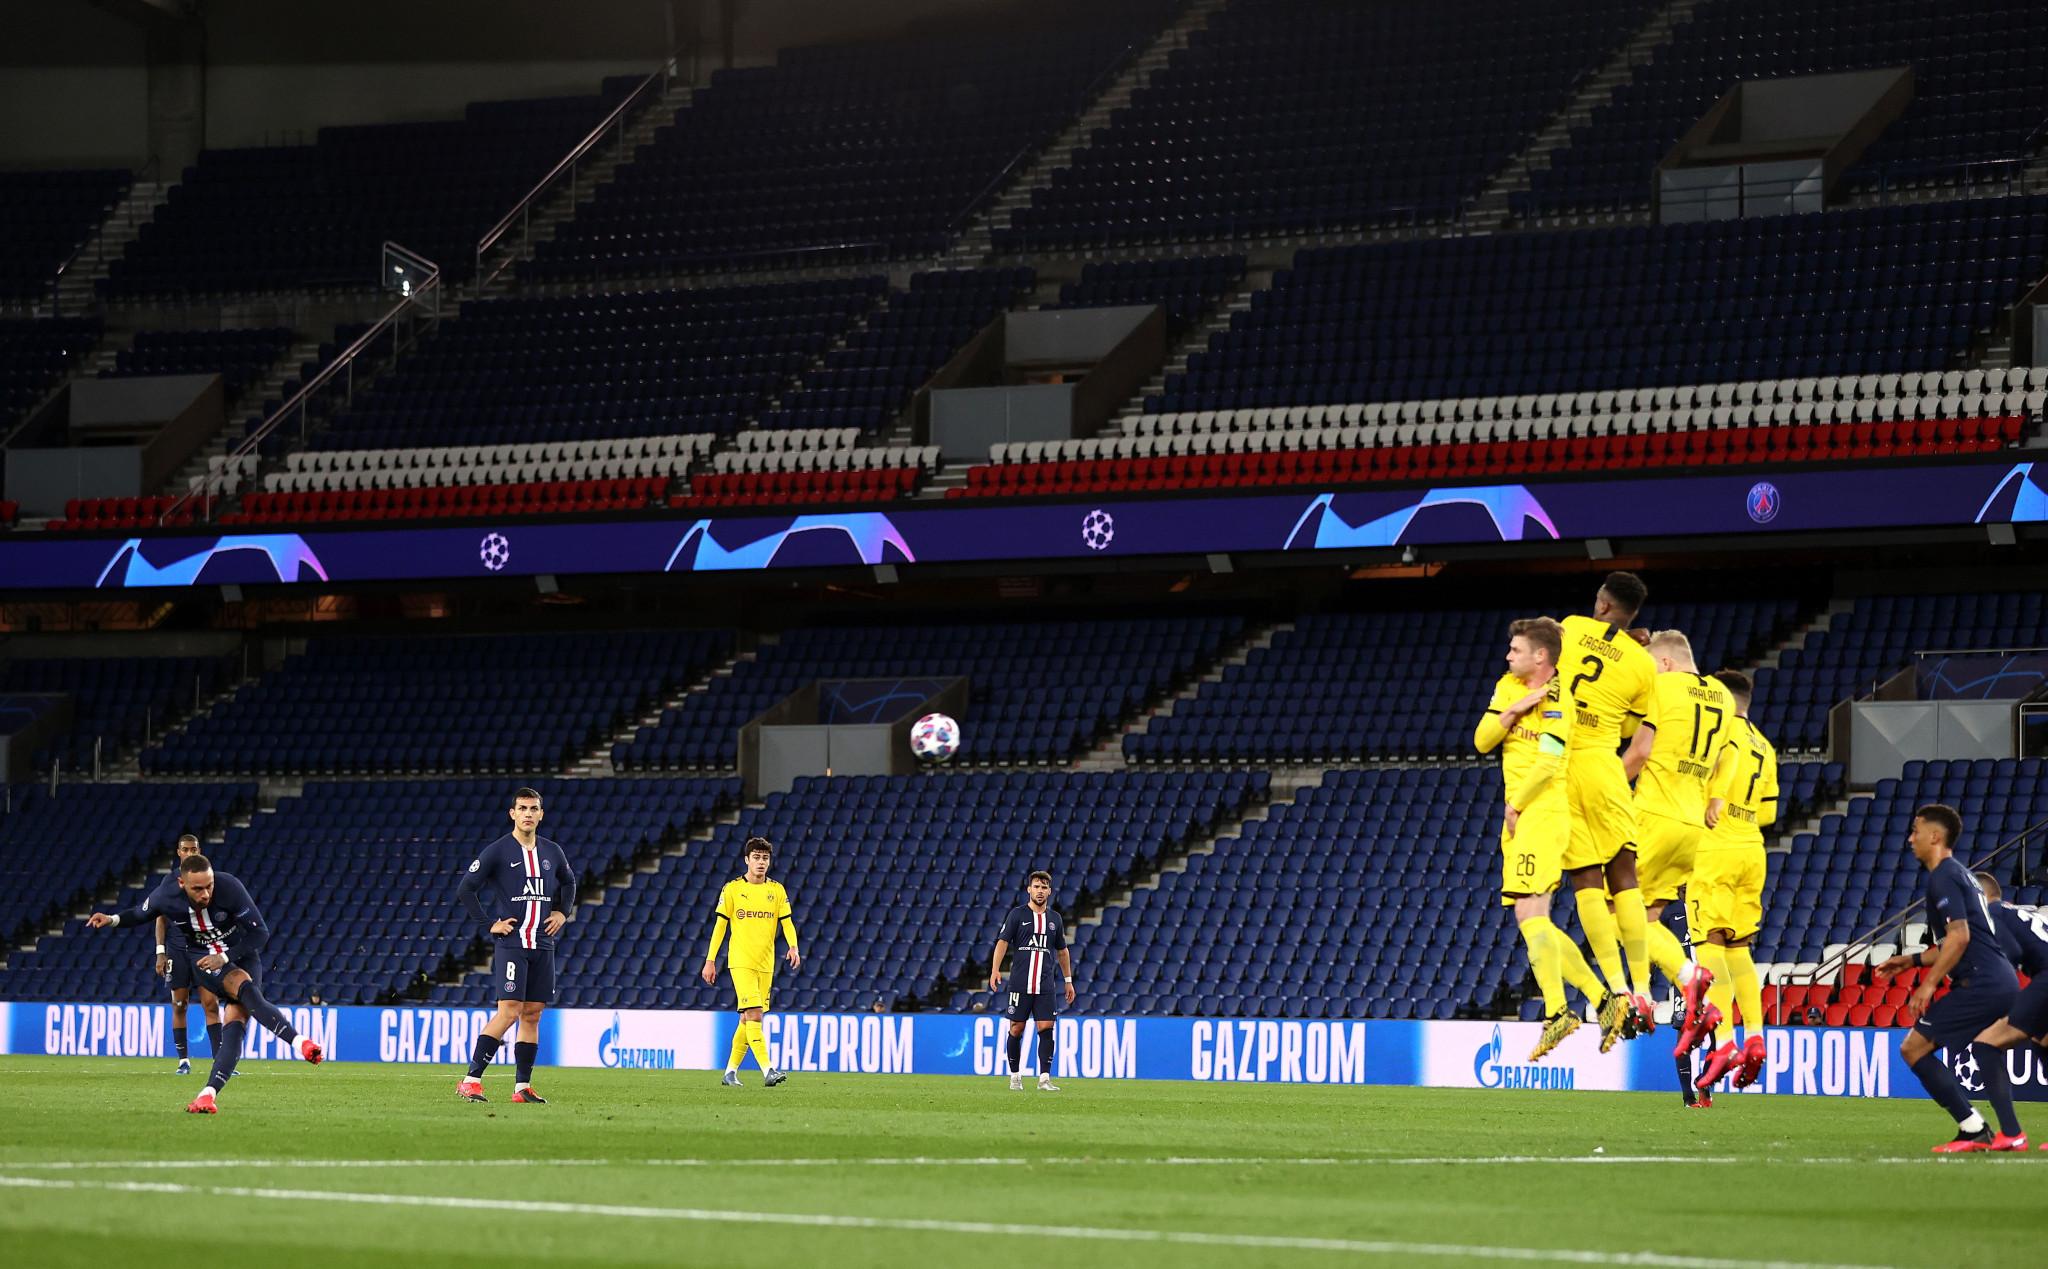 Paris Saint-Germain's Champions League second leg with Borussia Dortmund was held behind closed doors ©Getty Images